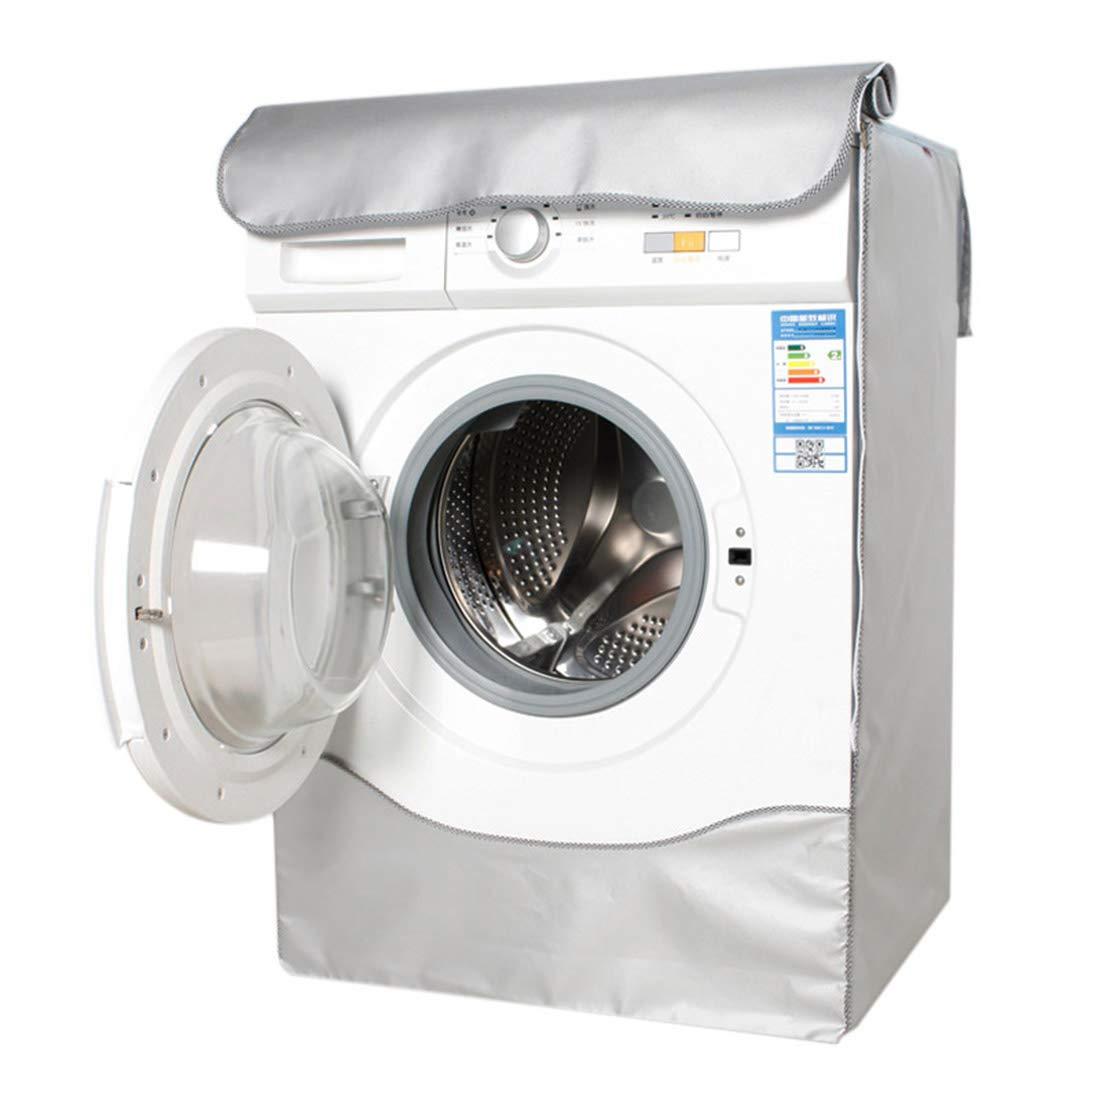 Enerhu Washing Machine Cover 2-way Zipper Sunscreen Waterproof Smoke-proof Protective No Elasticity Umbrella Cloth Front Load Washer Dust Cover